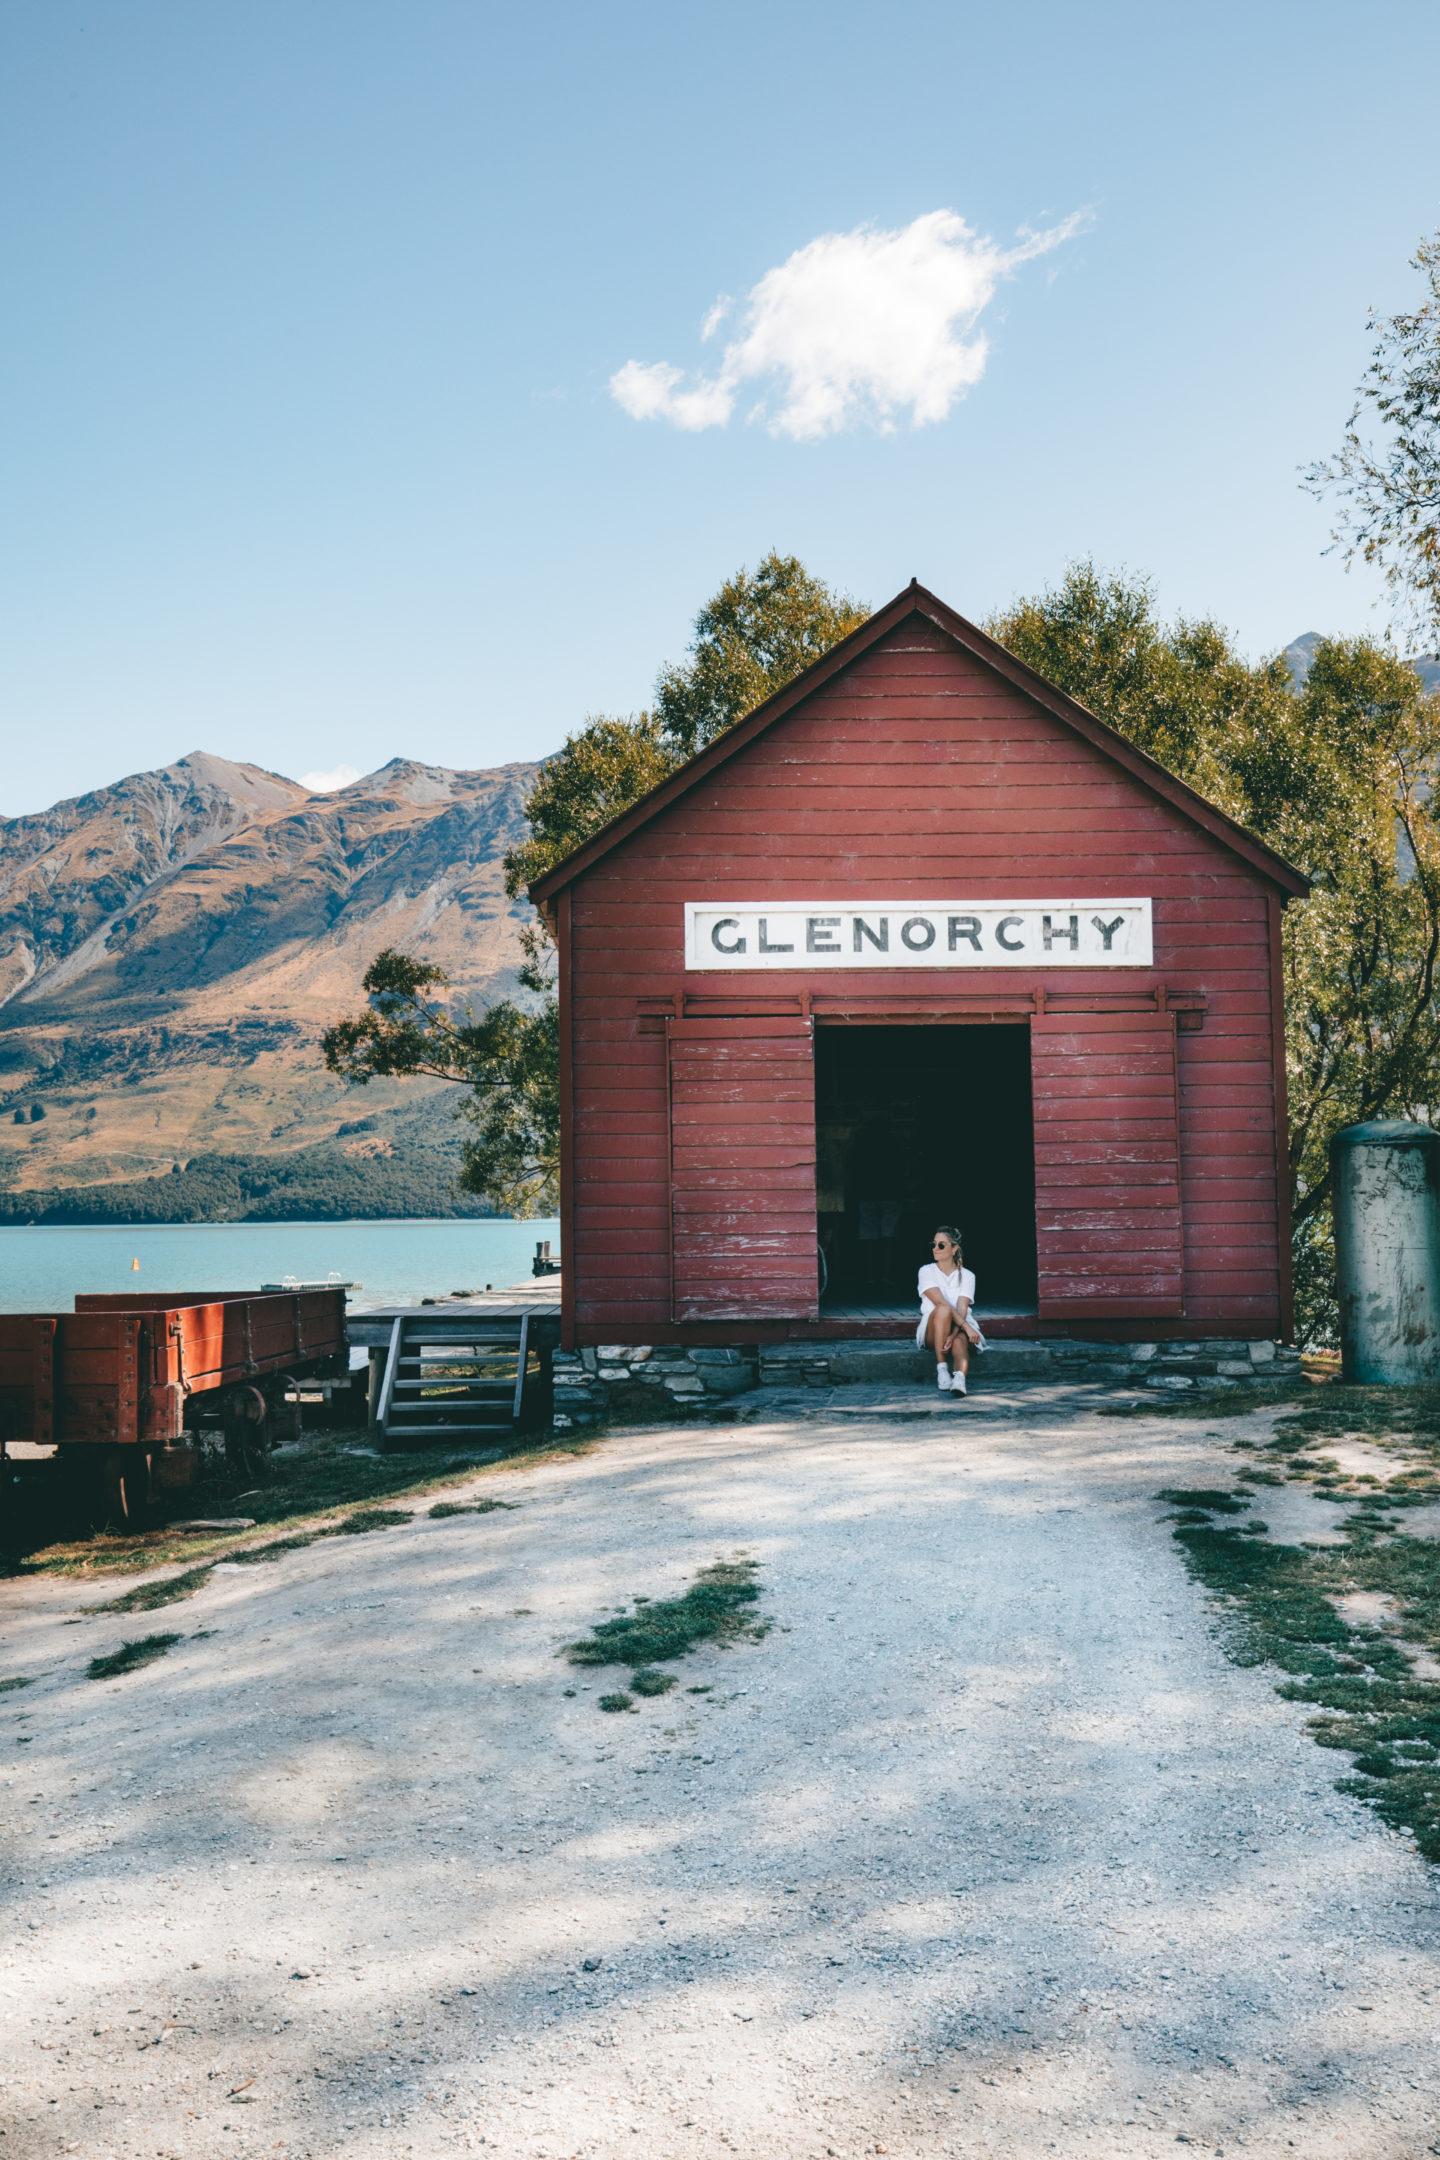 Glenorchy Nouvelle-Zélande - Blondie Baby blog voyages et mode